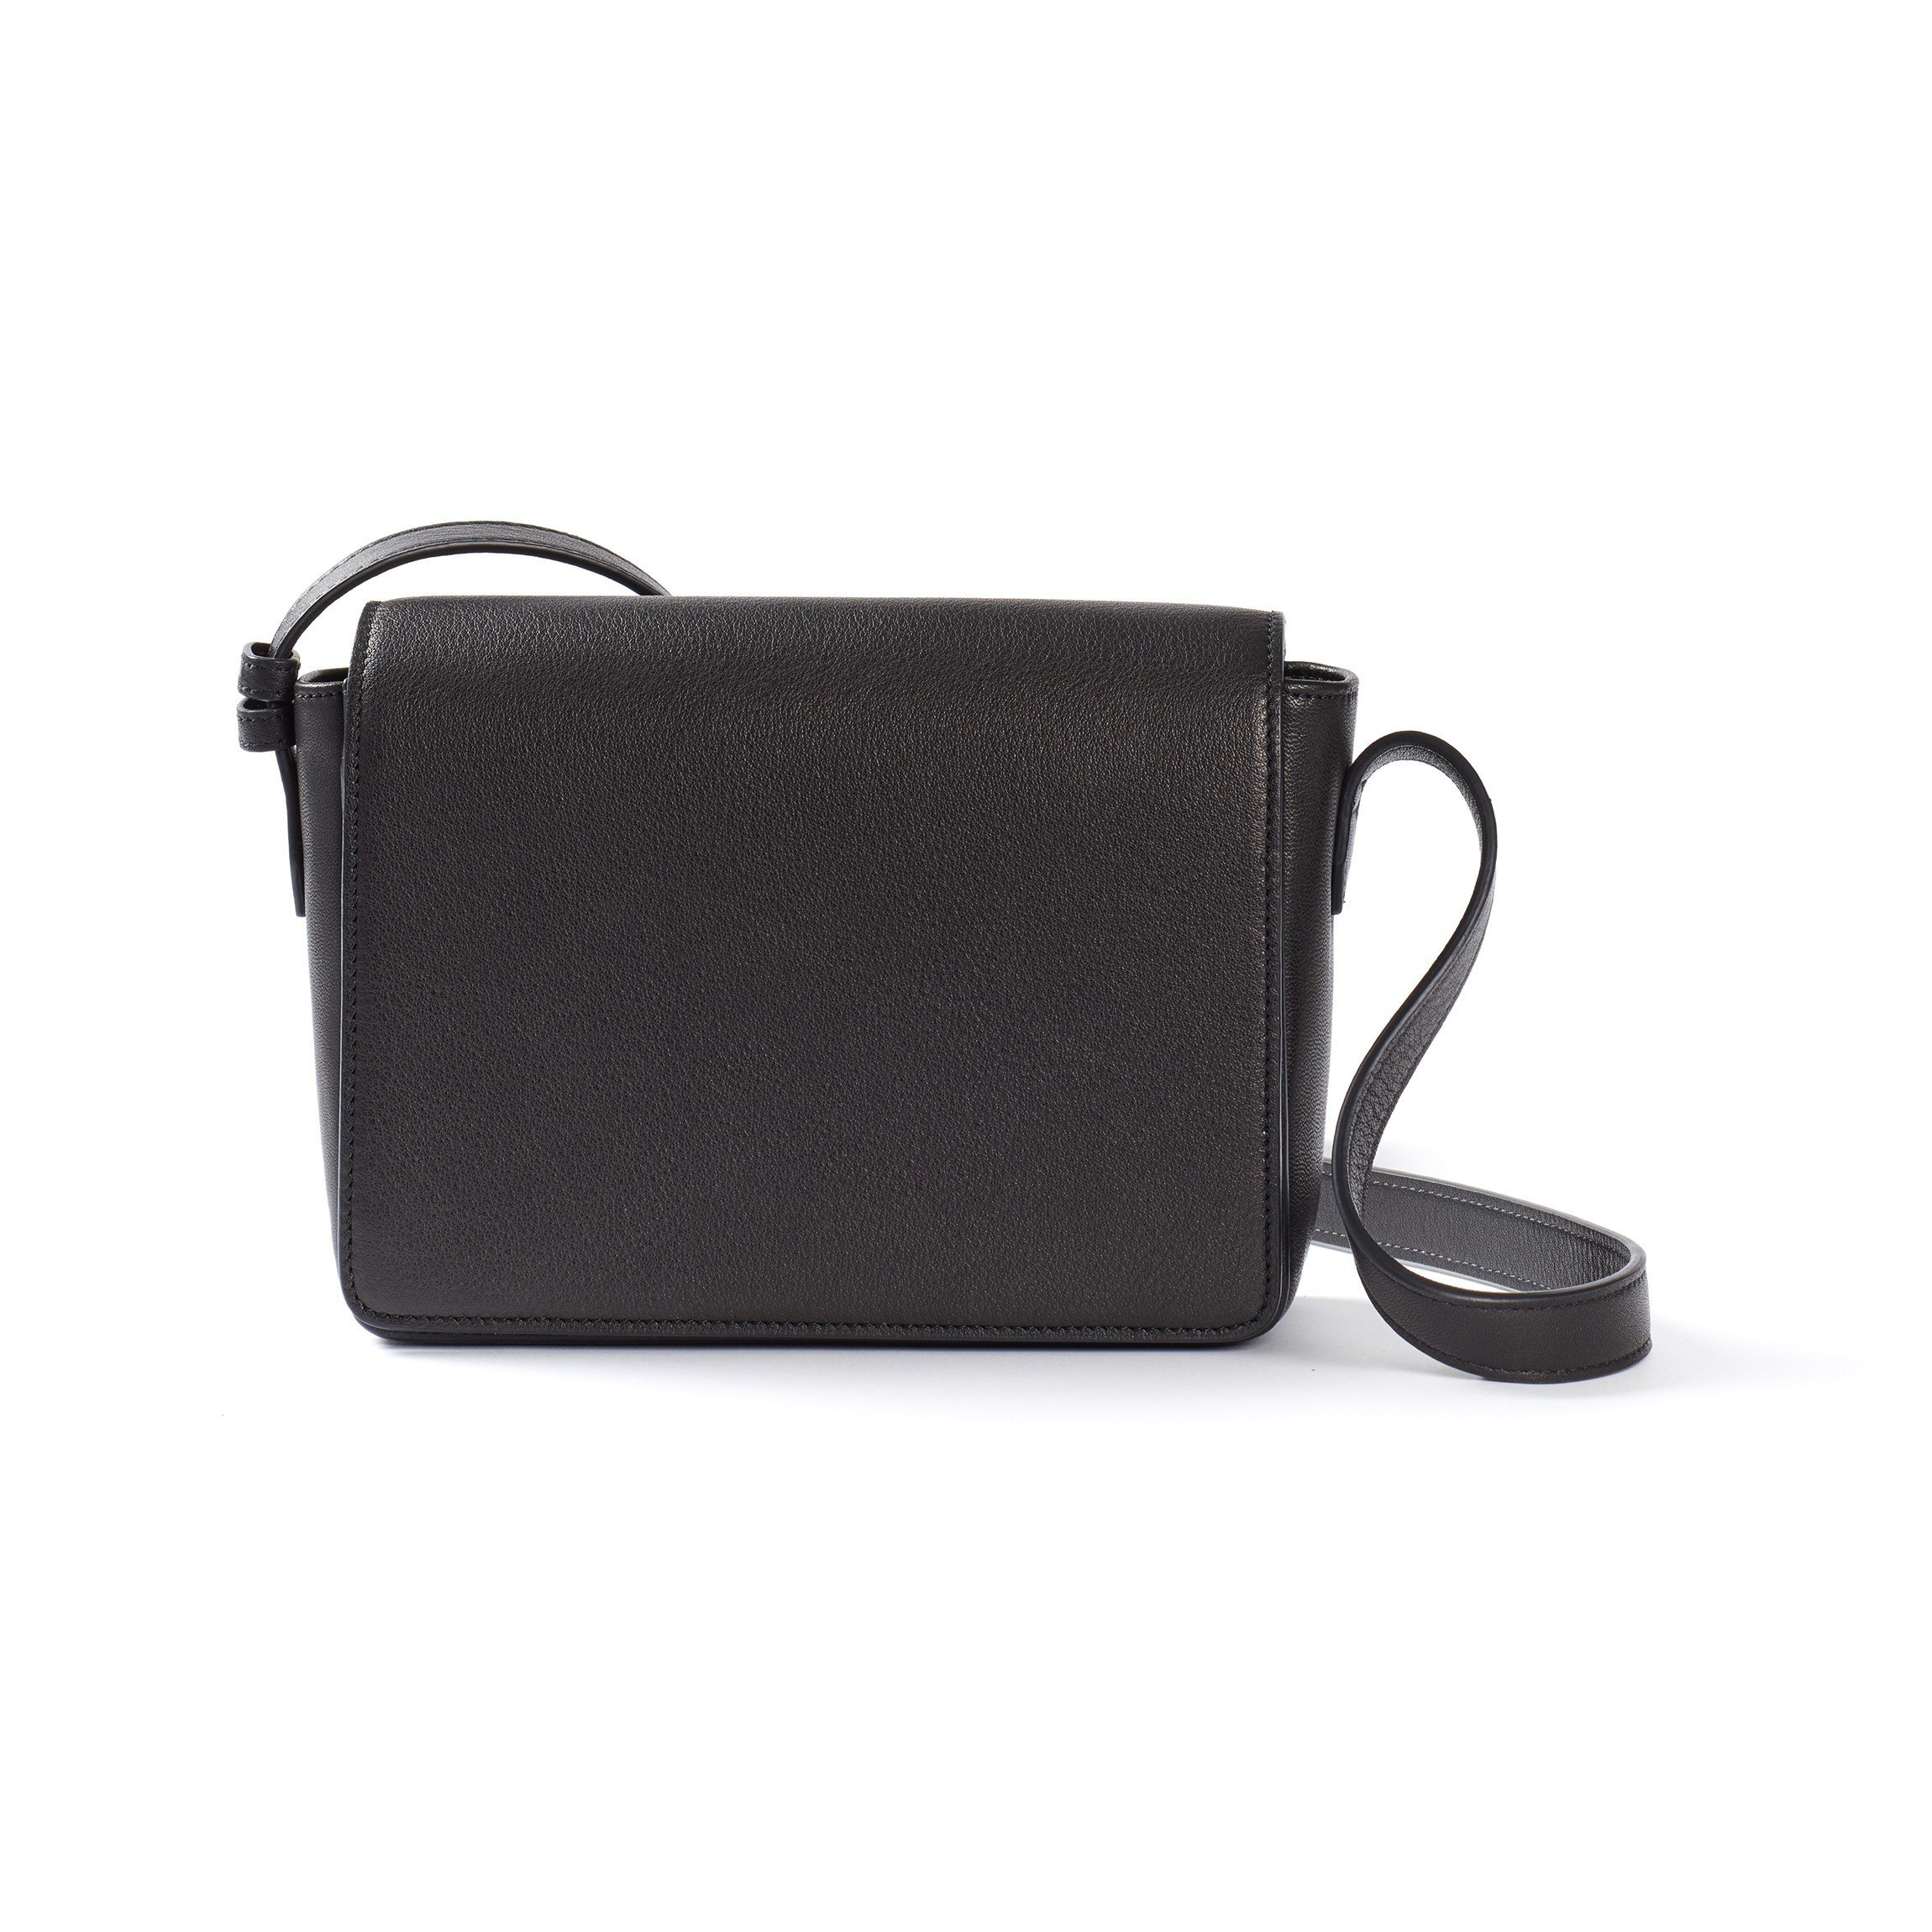 Addison Crossbody - Full Grain Leather - Black Onyx (black)